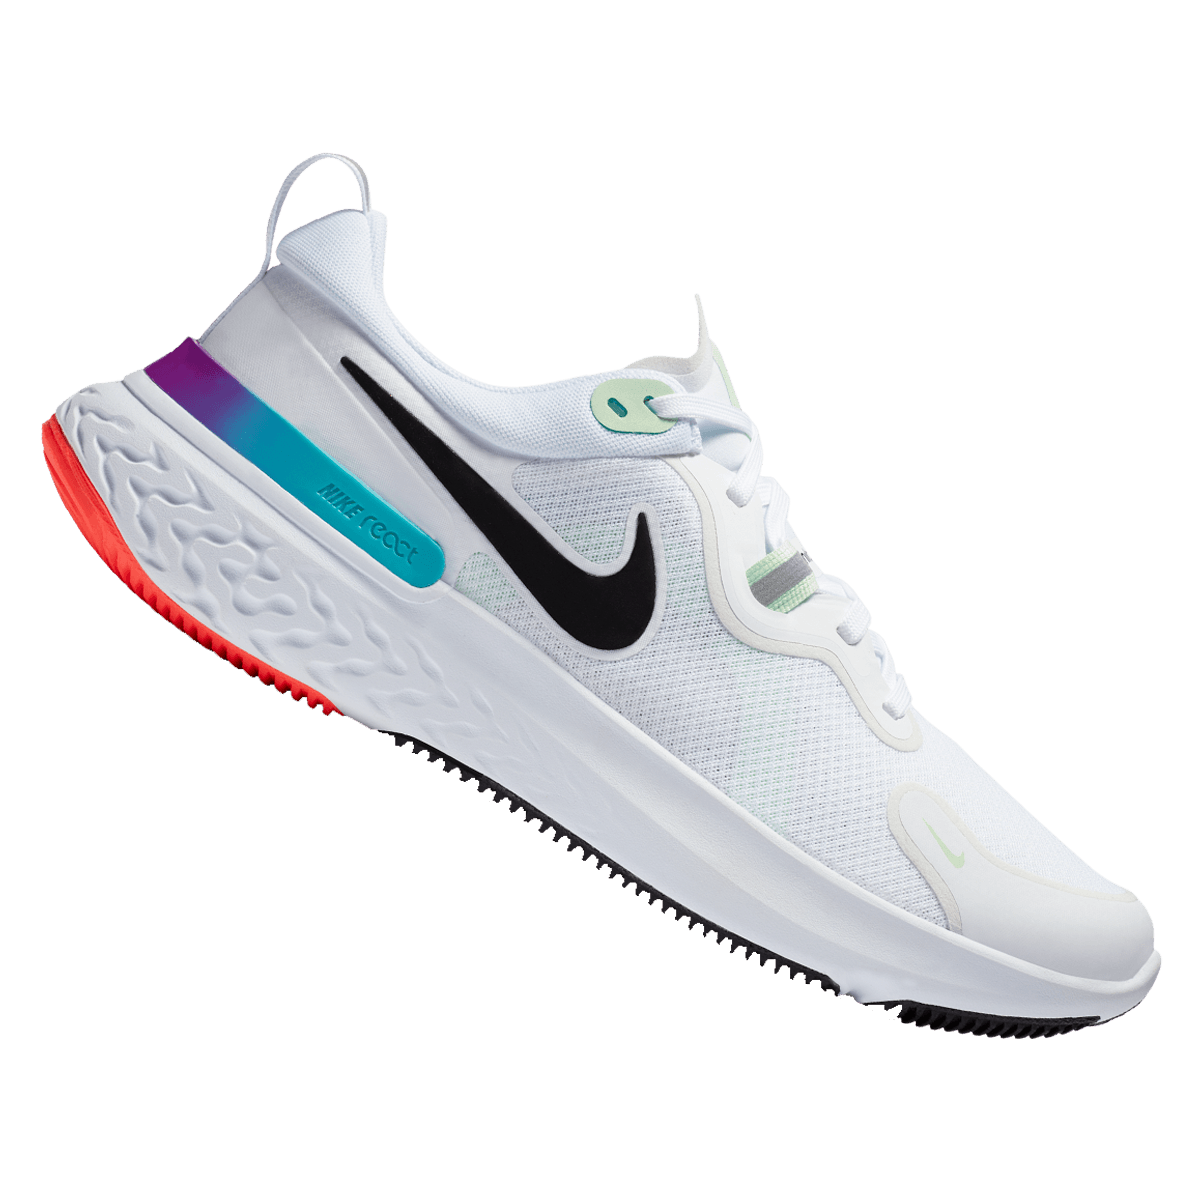 Nike Laufschuh React Miler weiß/schwarz